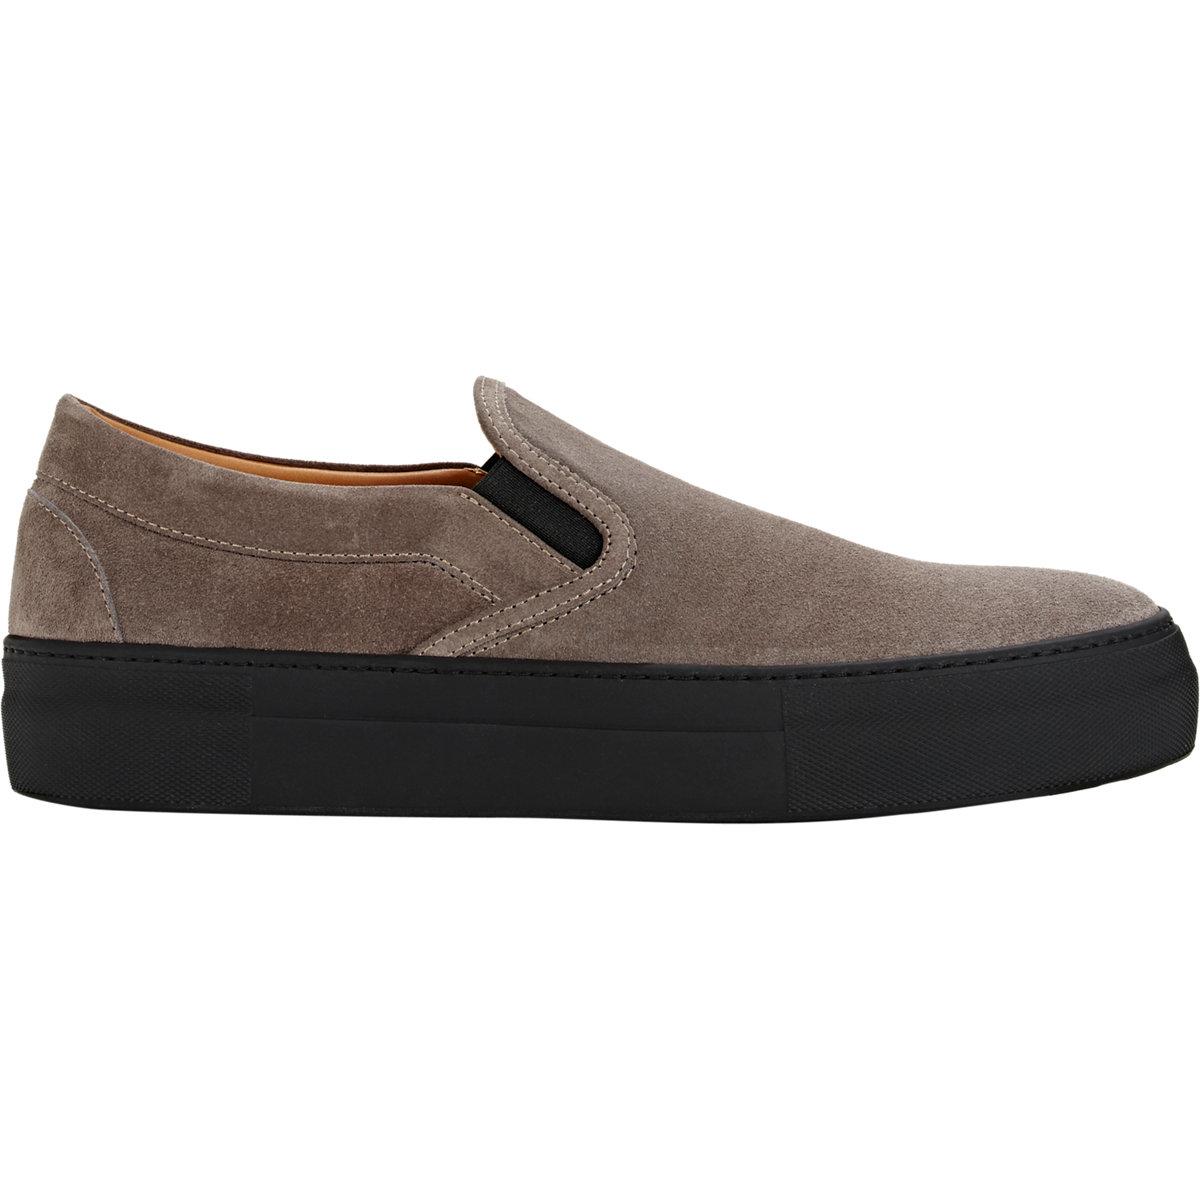 barneys new york suede slip on platform sneakers in gray